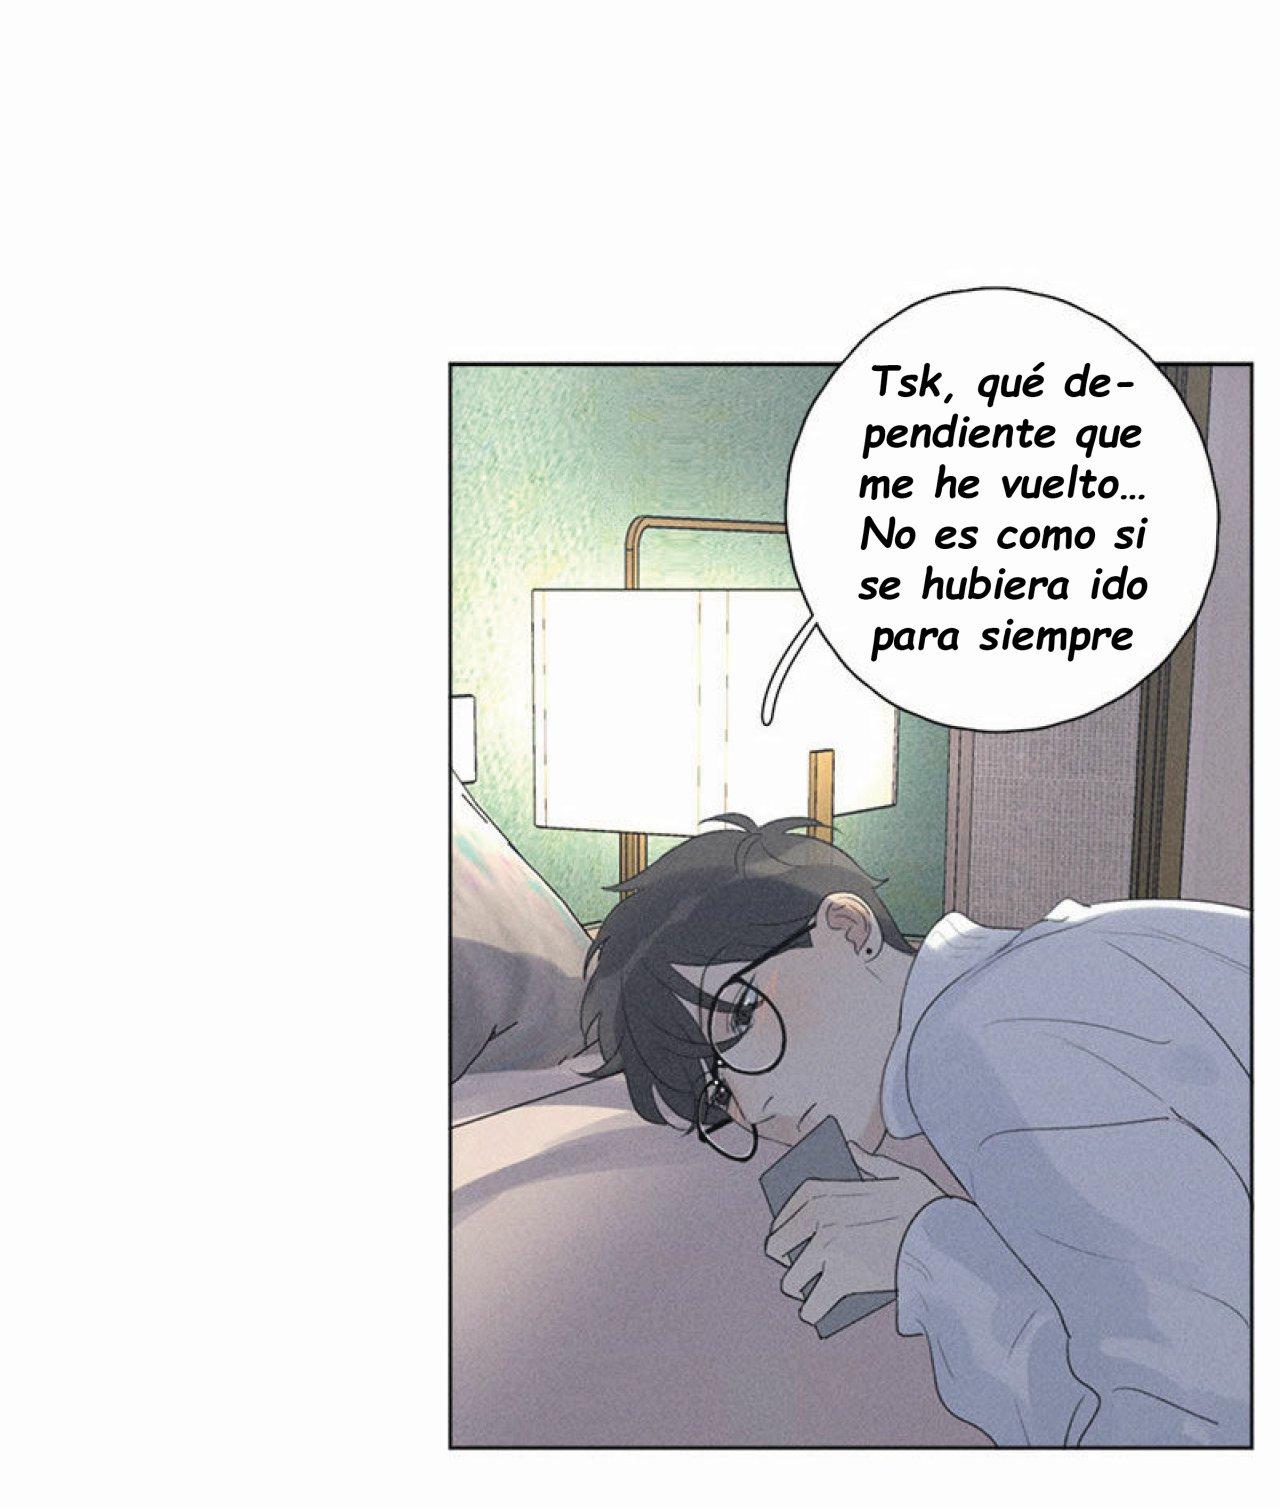 https://nine.mangadogs.com/es_manga/pic8/29/24925/946329/147540e129e096fa91700e9db6588354.jpg Page 45